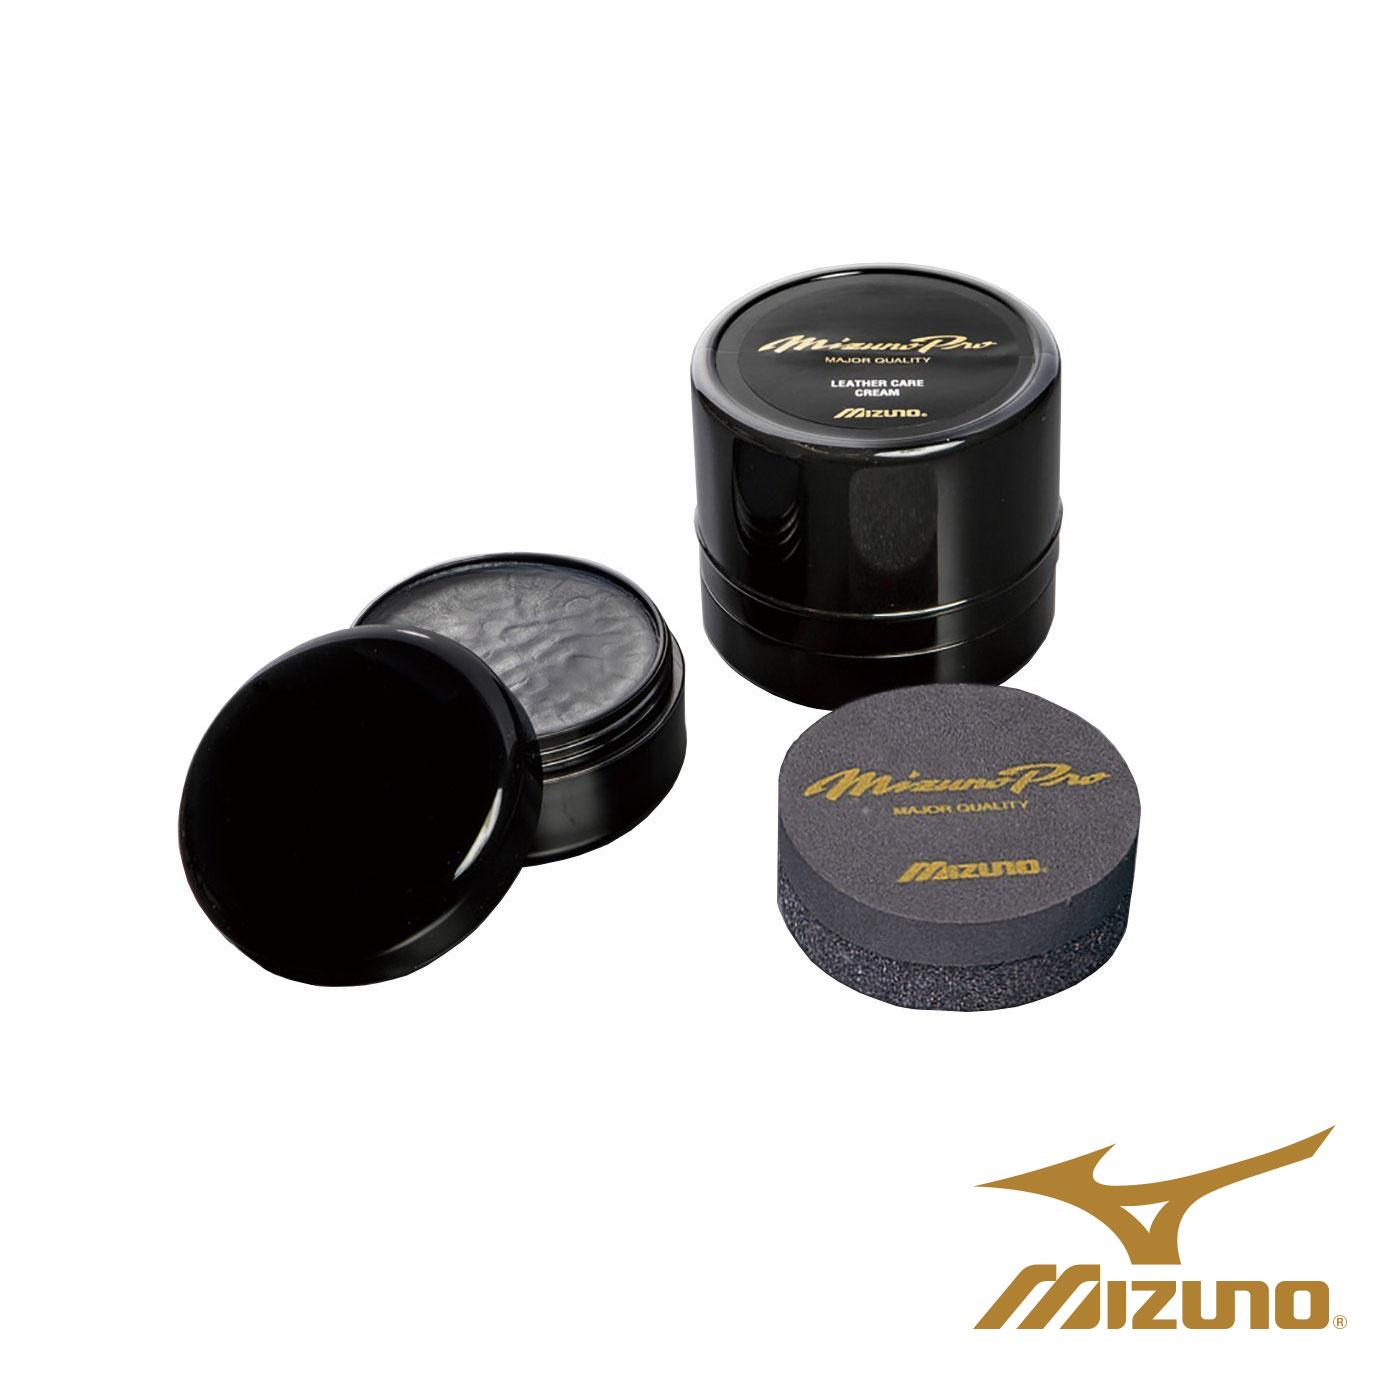 MIZUNO 特定-日製高級保革霜 1GJYG50000 - 依賣場